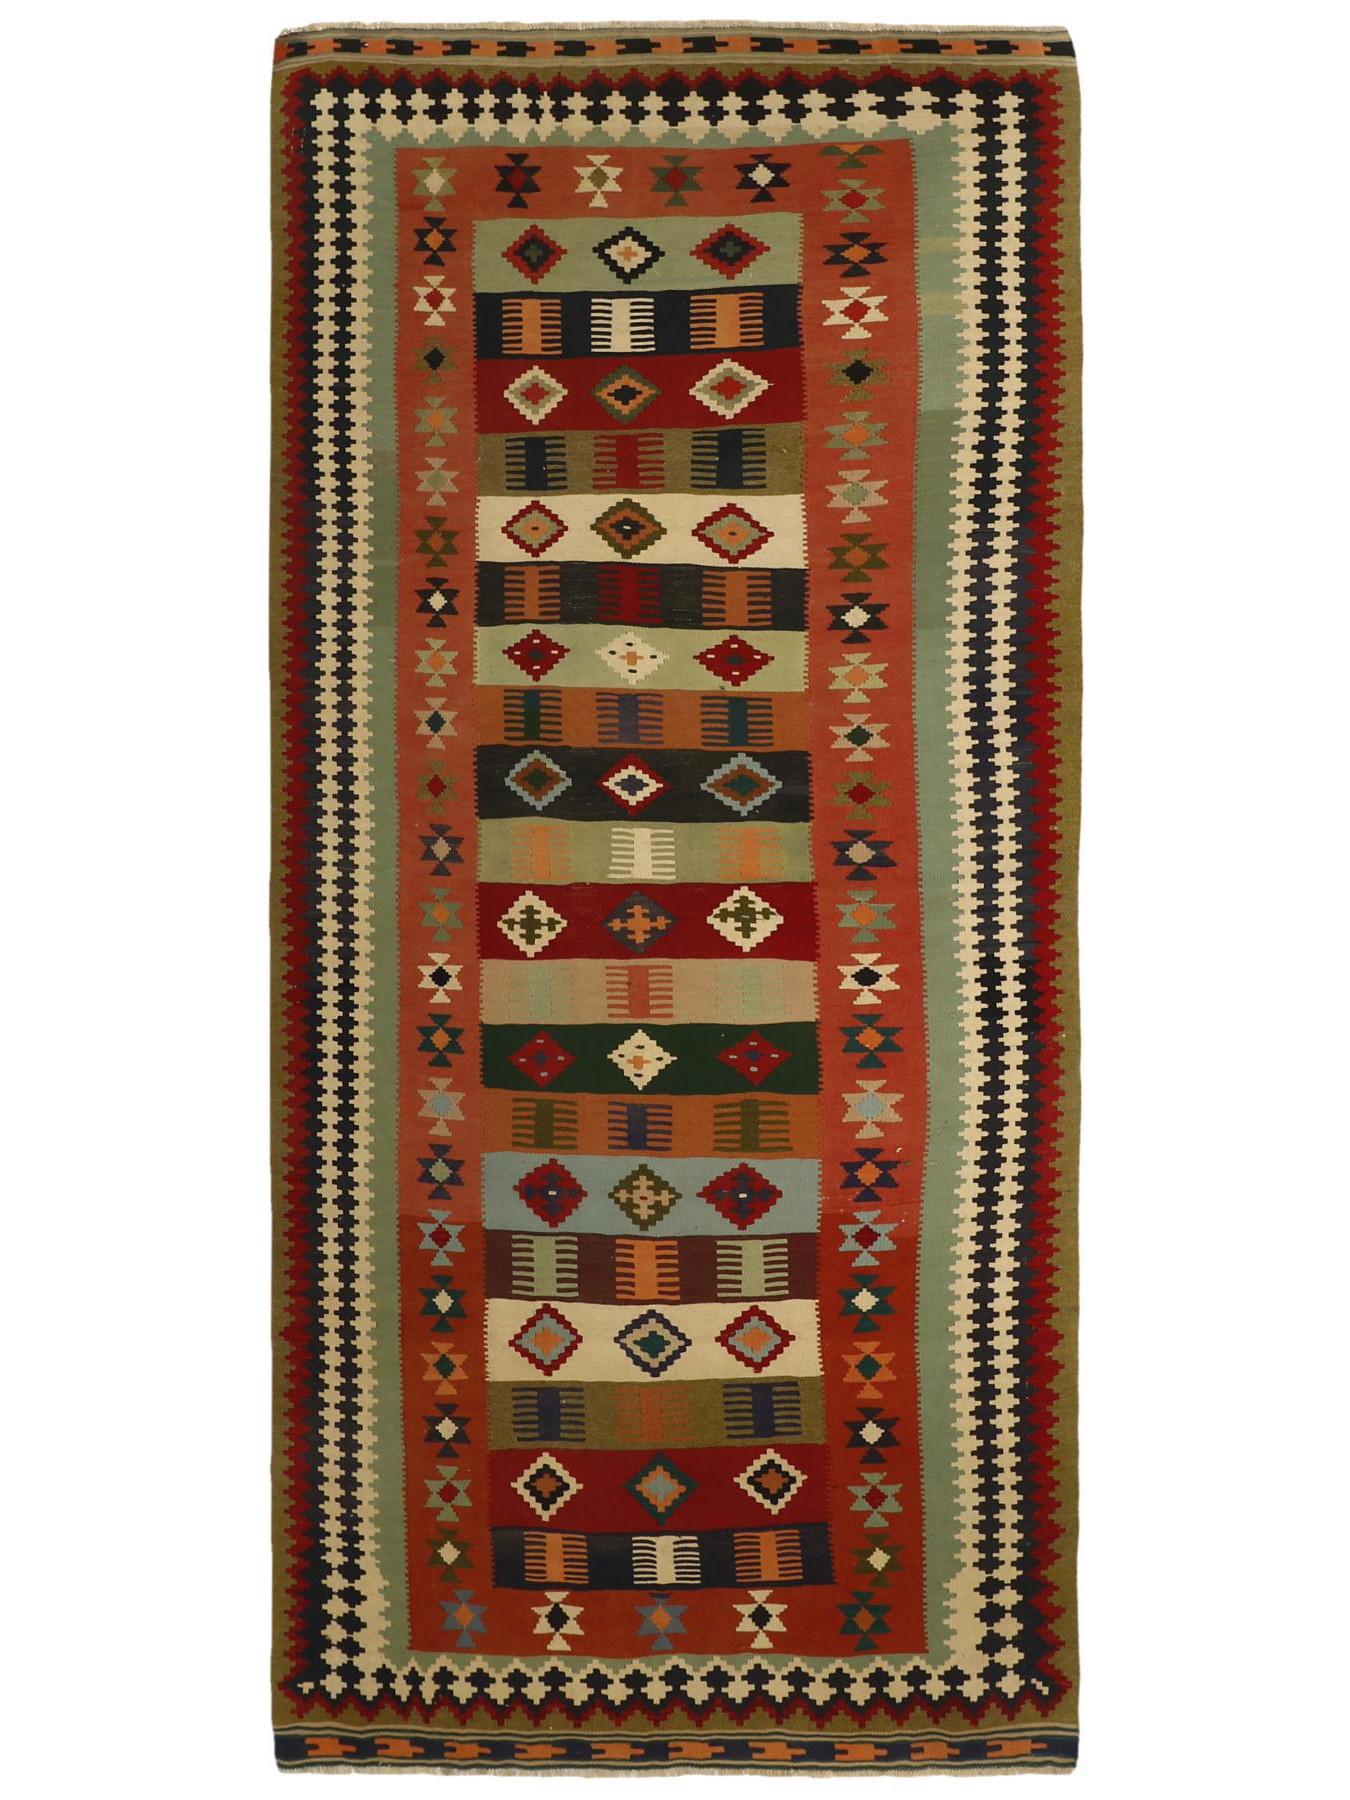 Kilims traditionnels - Kilim Persan Vintage